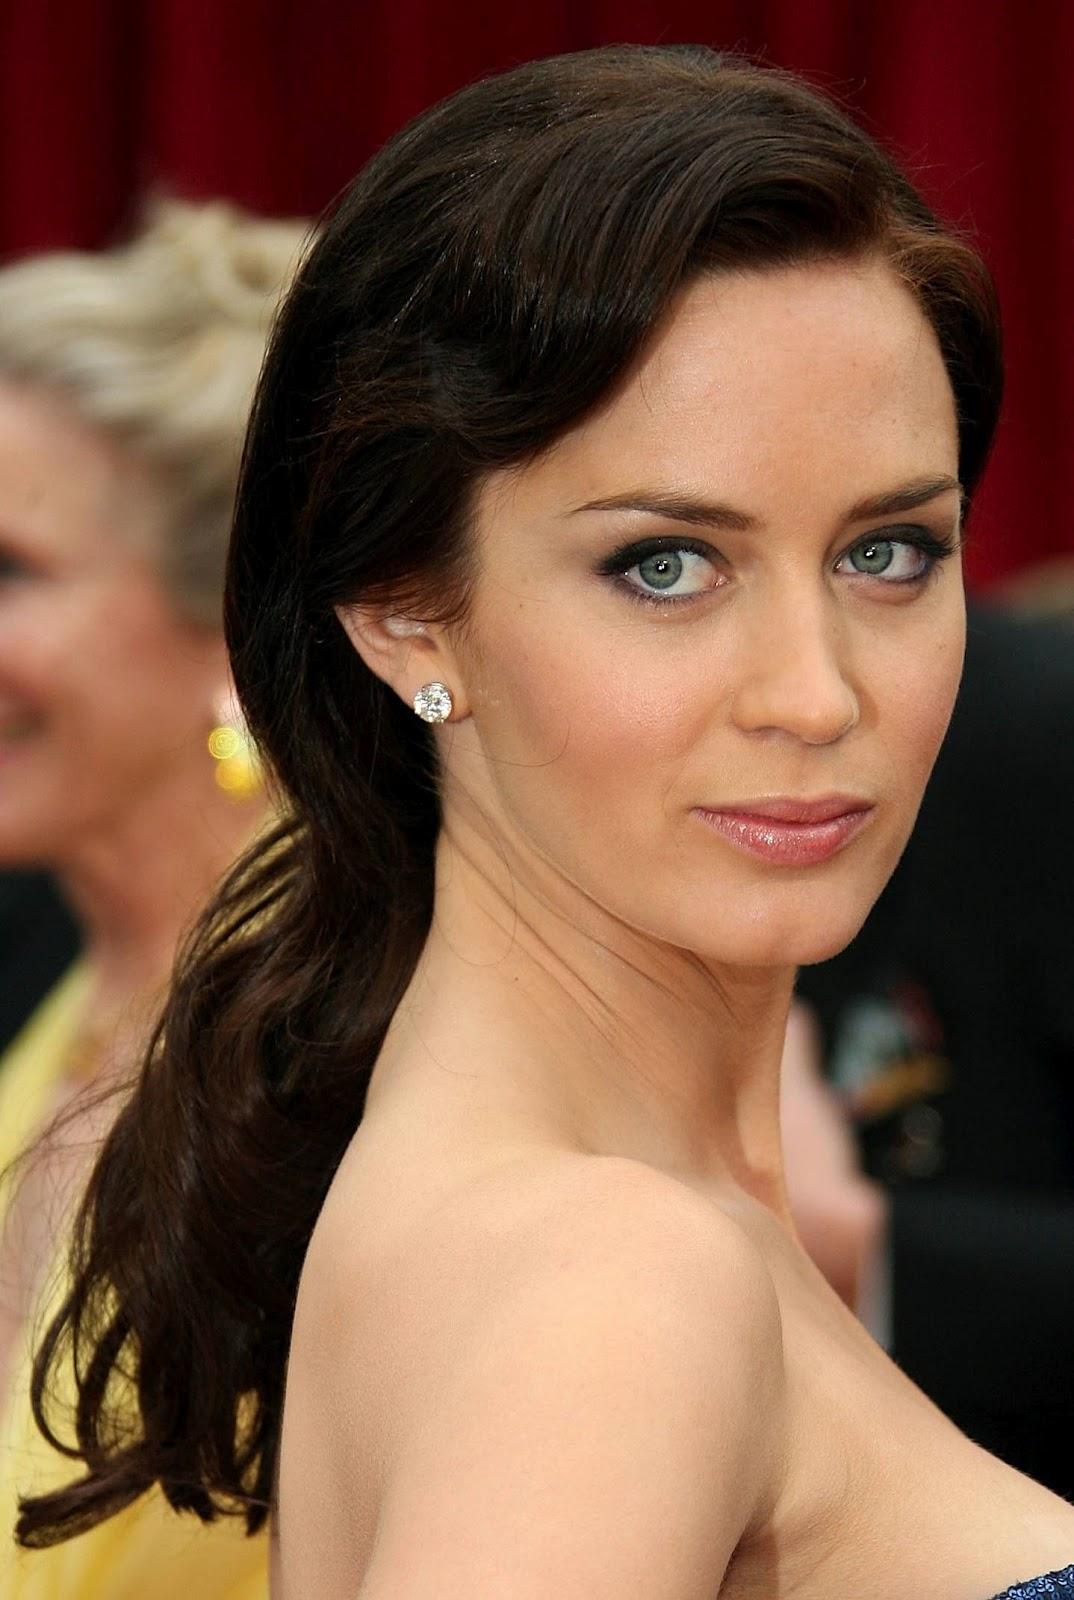 http://2.bp.blogspot.com/-ok8EI6SZMYY/UBBbbGPFhaI/AAAAAAAAFHo/h2RmHP79UHw/s1600/Emily-Blunt-hairstyles-celebrity-actress-film-wallpapers-longhair-pictures-blunt-emily+(2).jpg